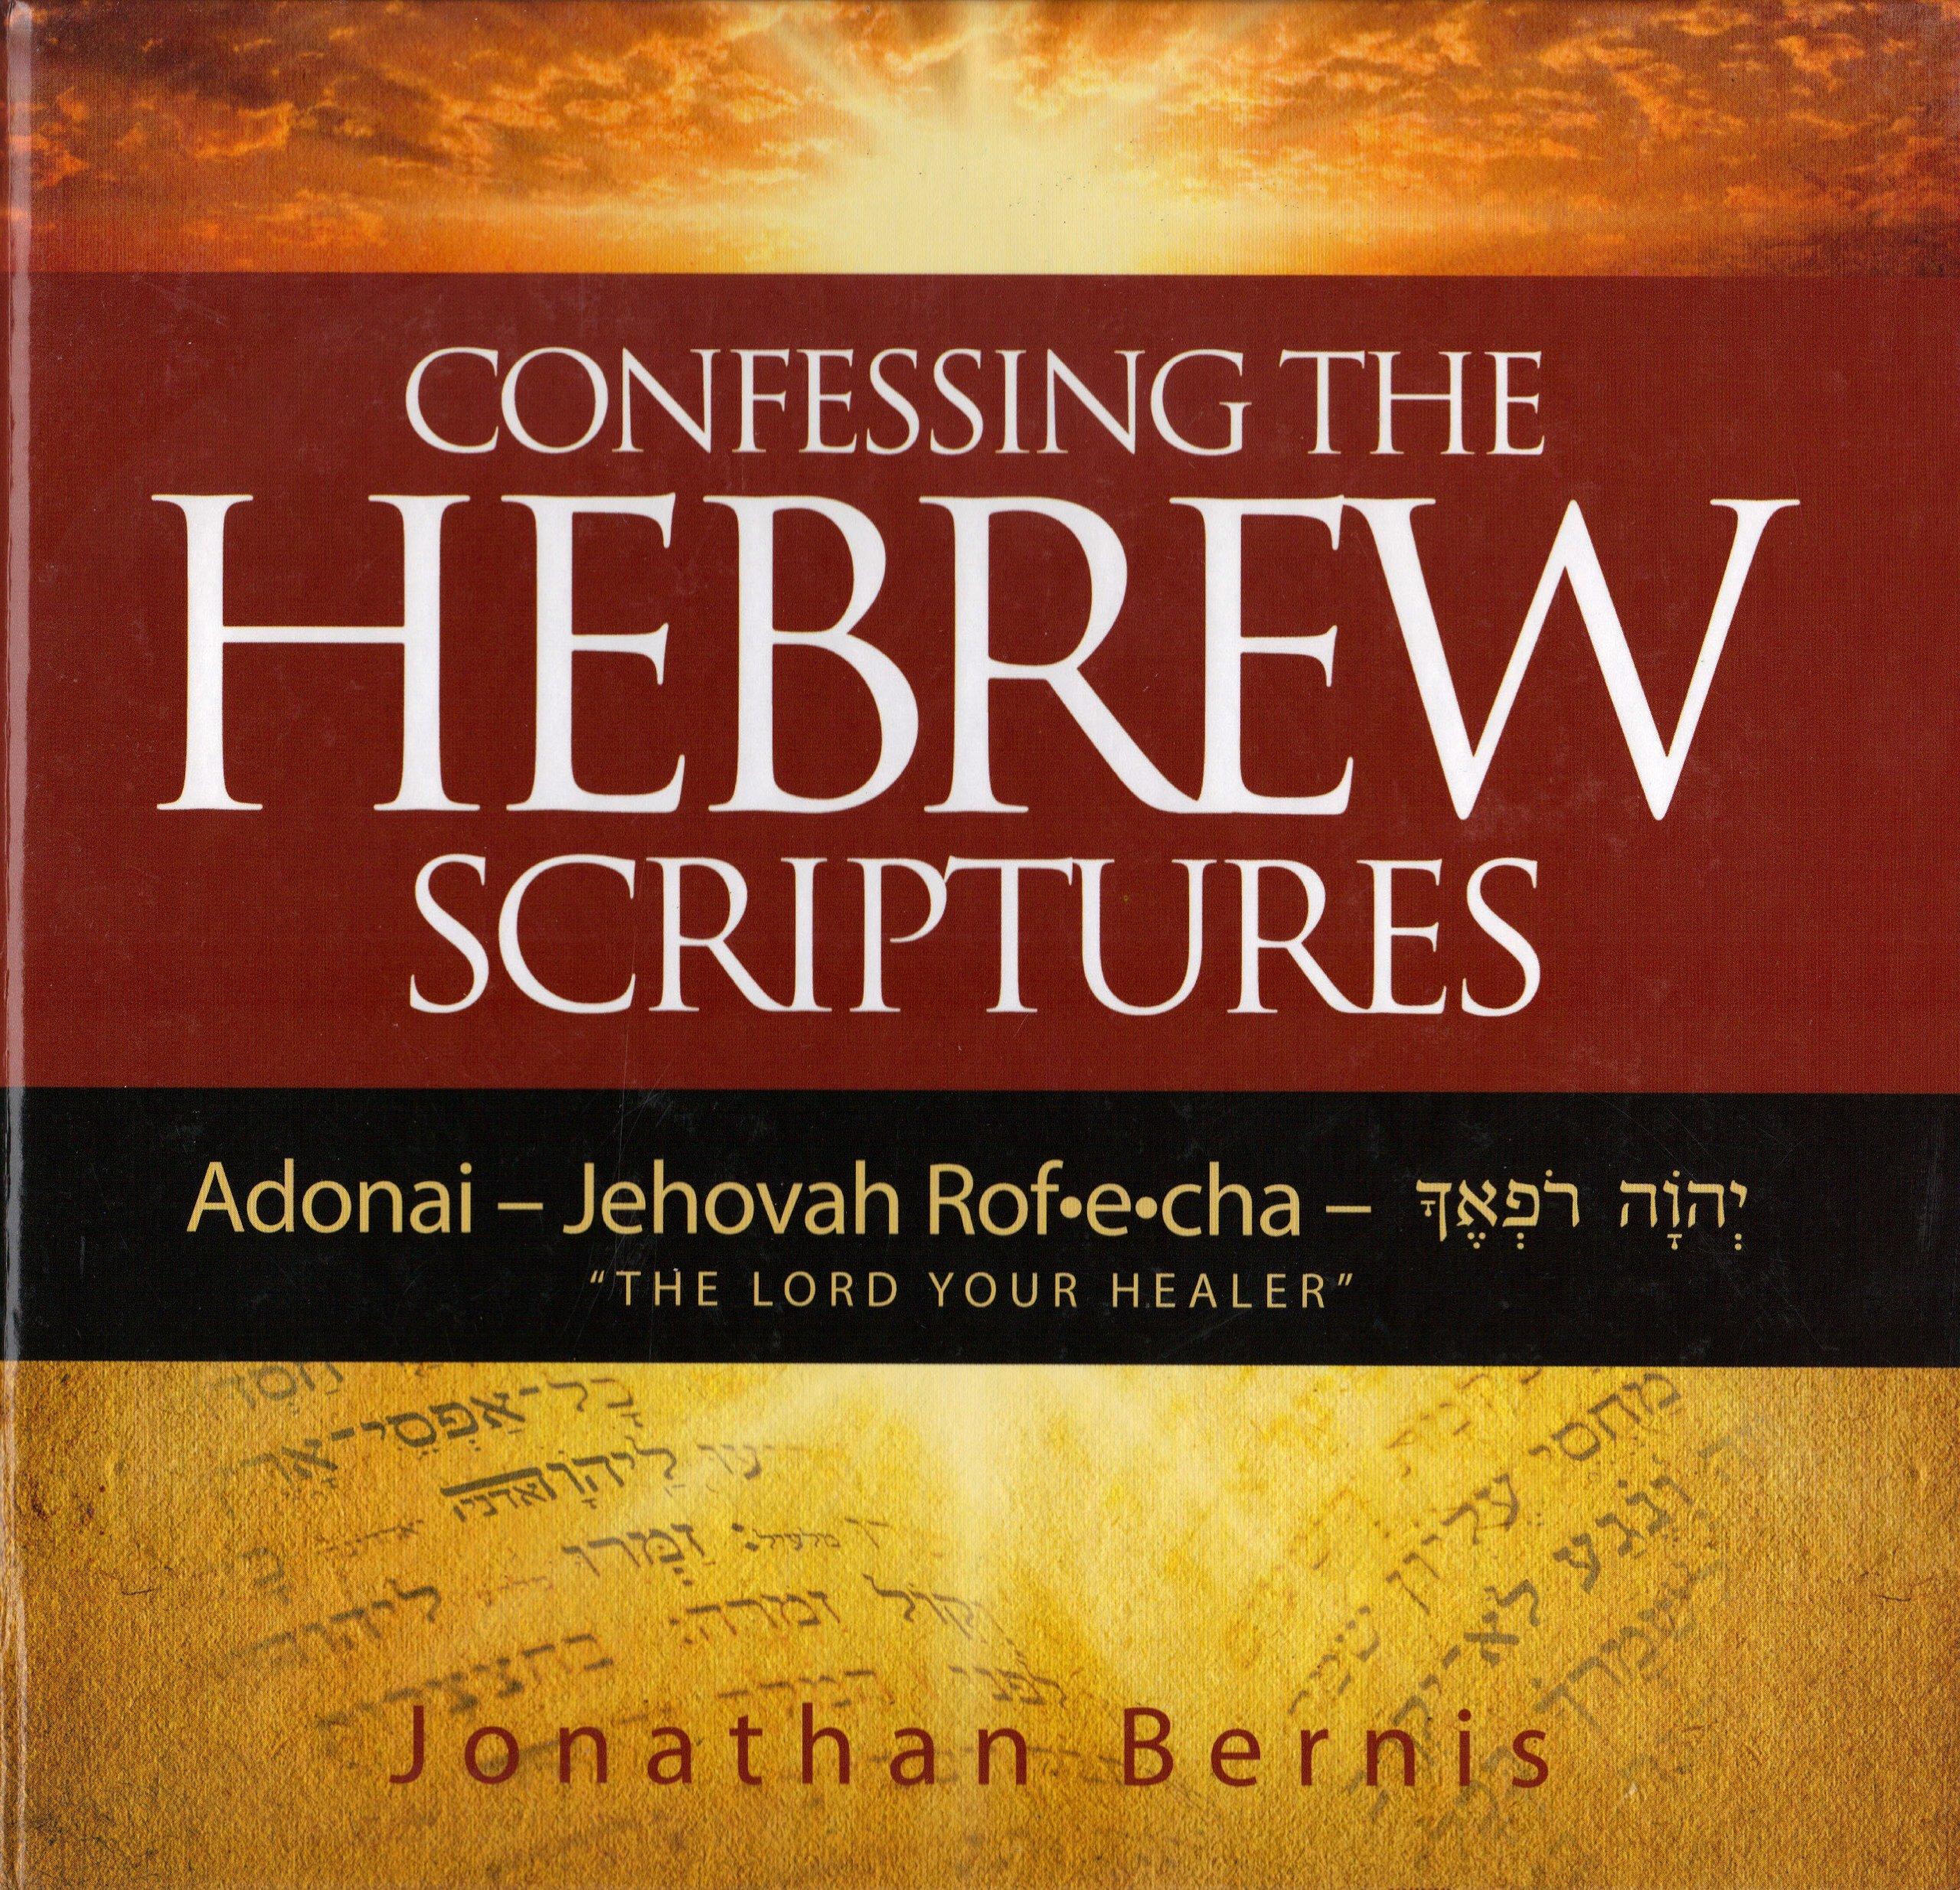 Confessing the Hebrew Scriptures (Adonai - Jehovah Rof-e-cha